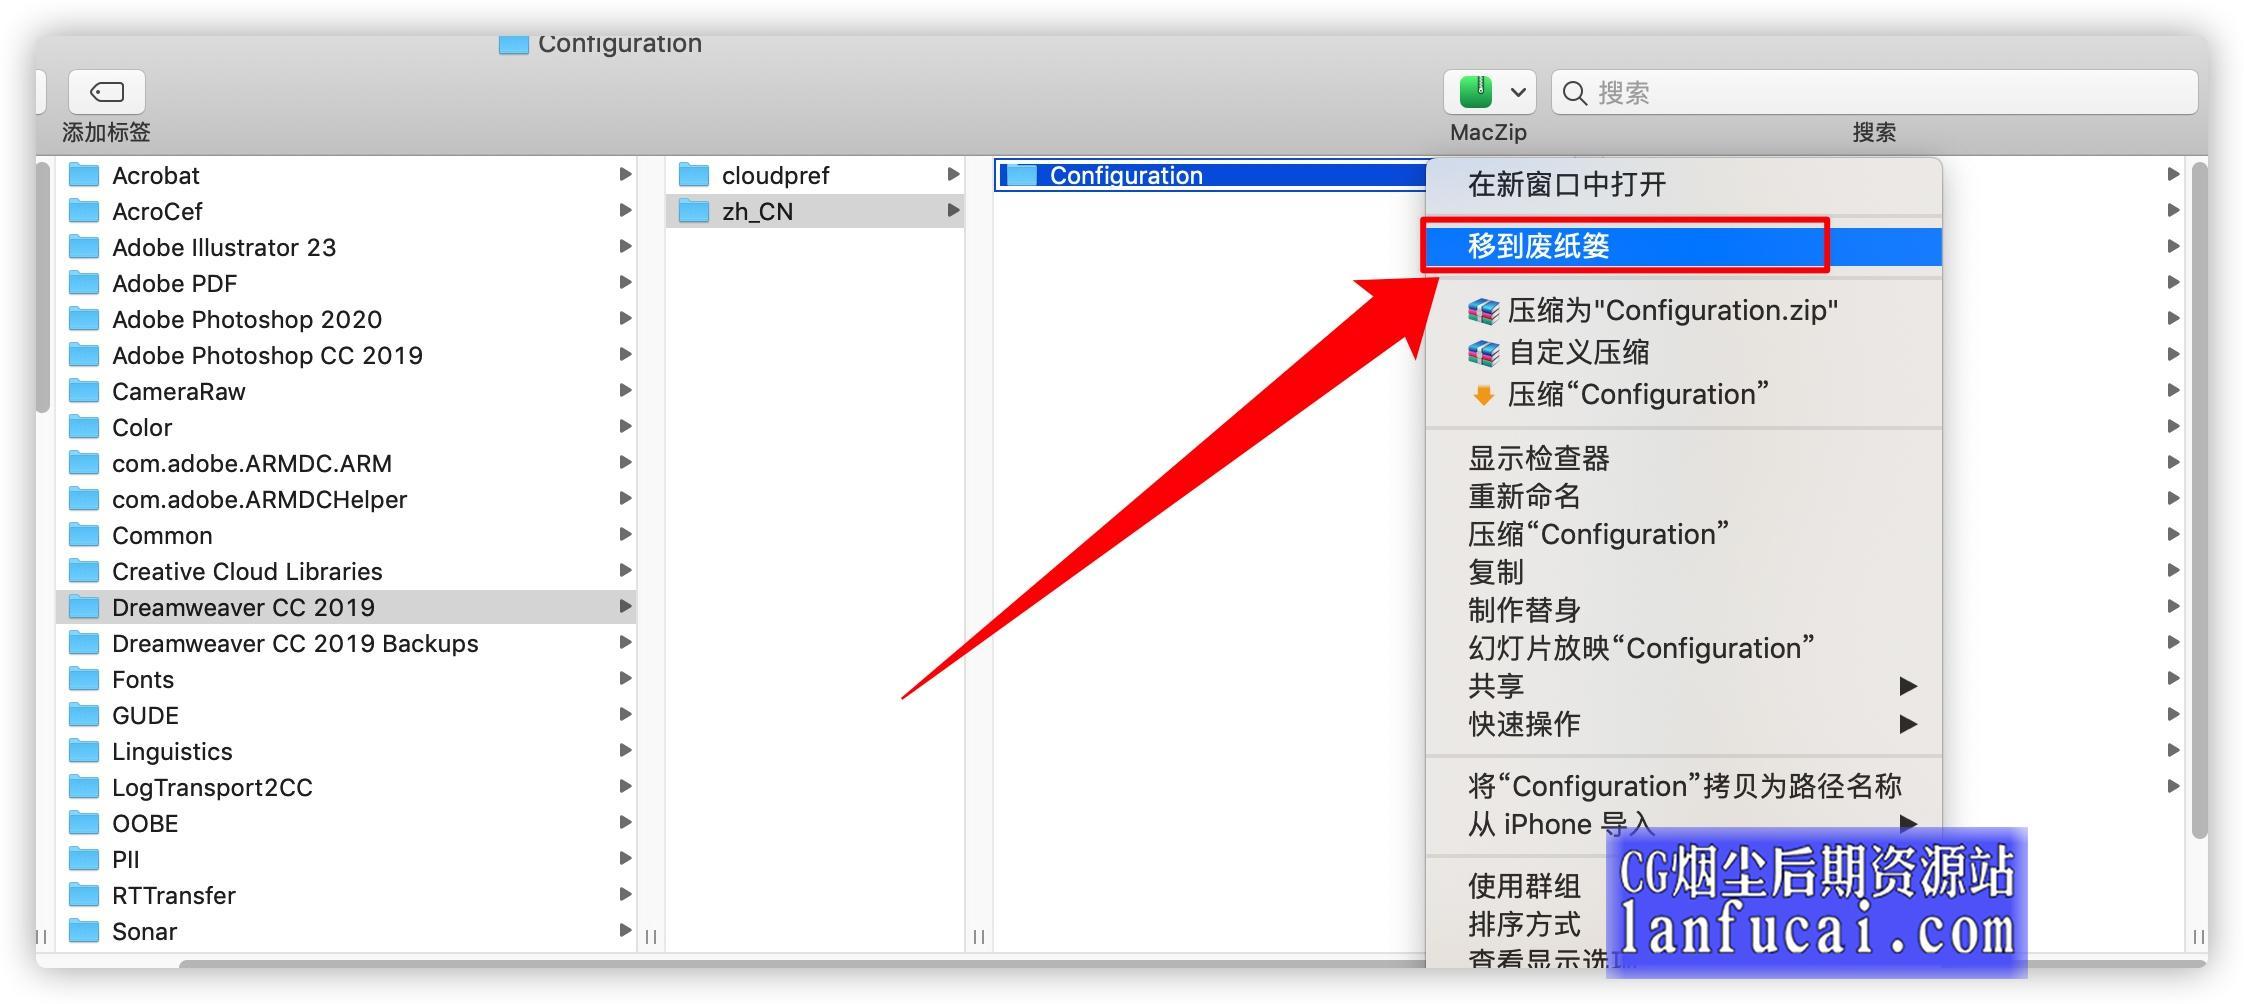 Configuration删除